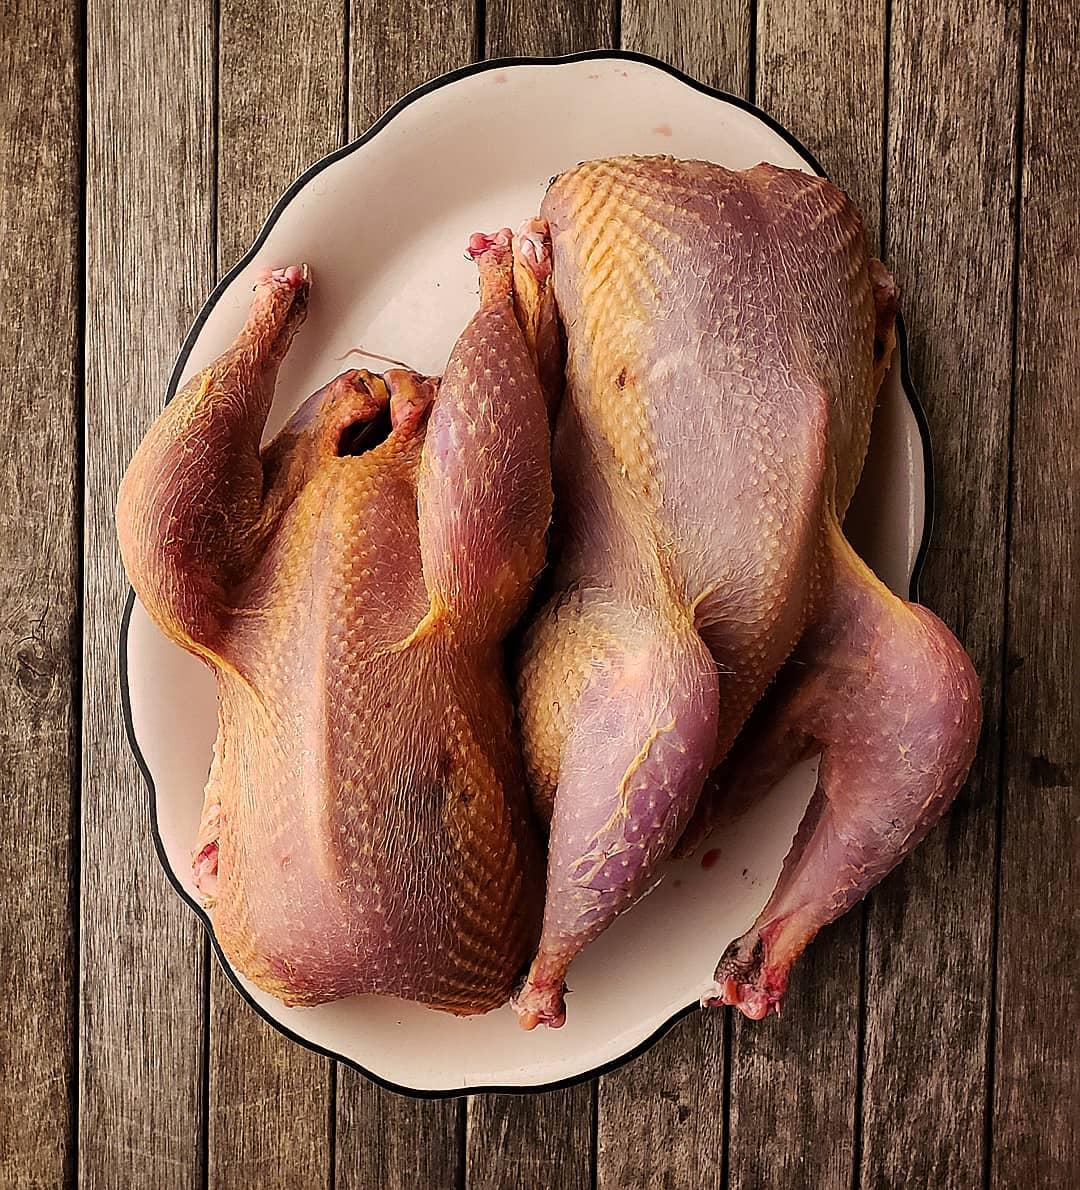 Plucked pheasants on a platter